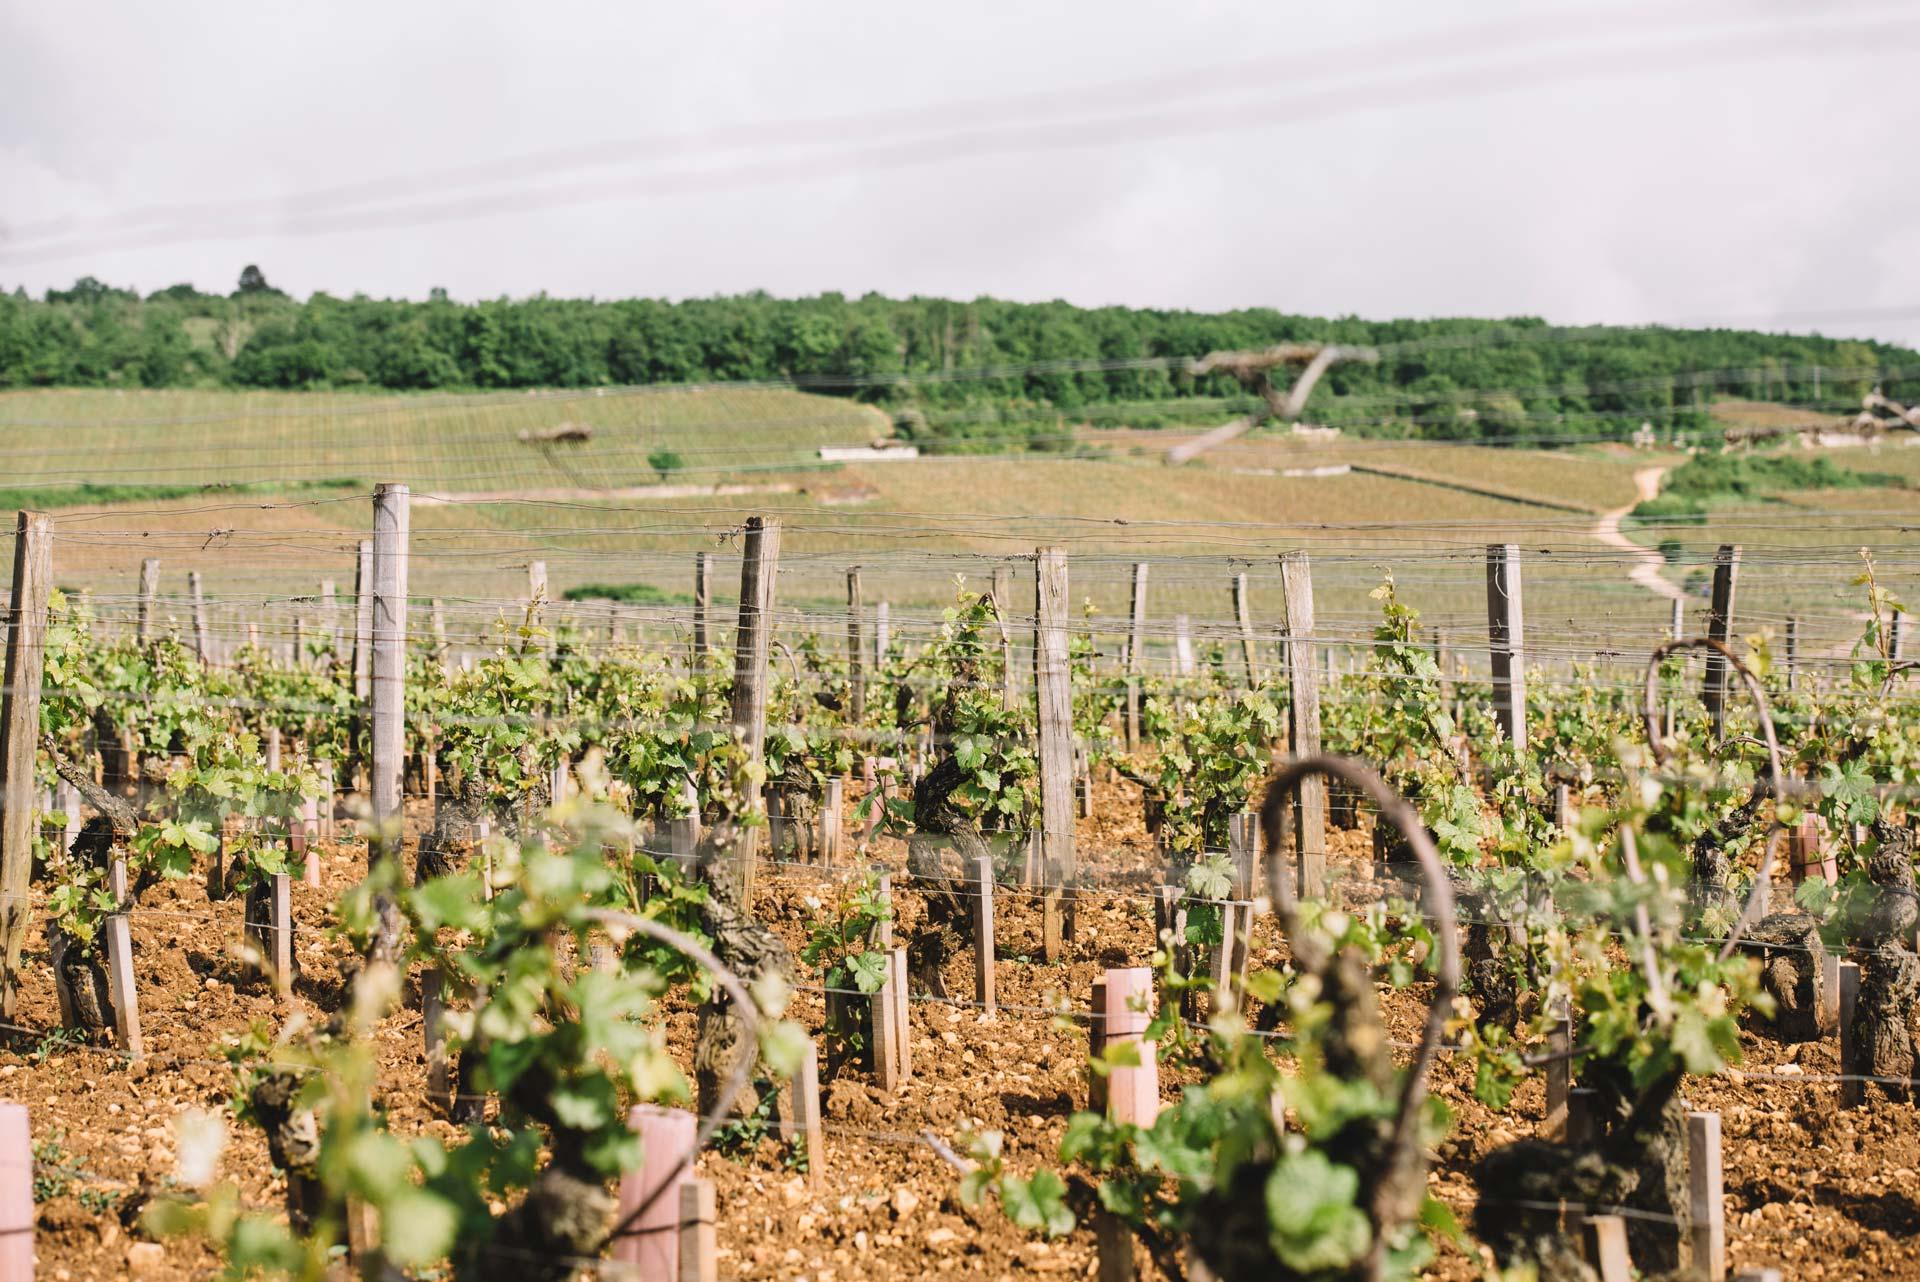 Tutoraggio in vigna   Domaine Leroy   Richebourg   Bourgogne